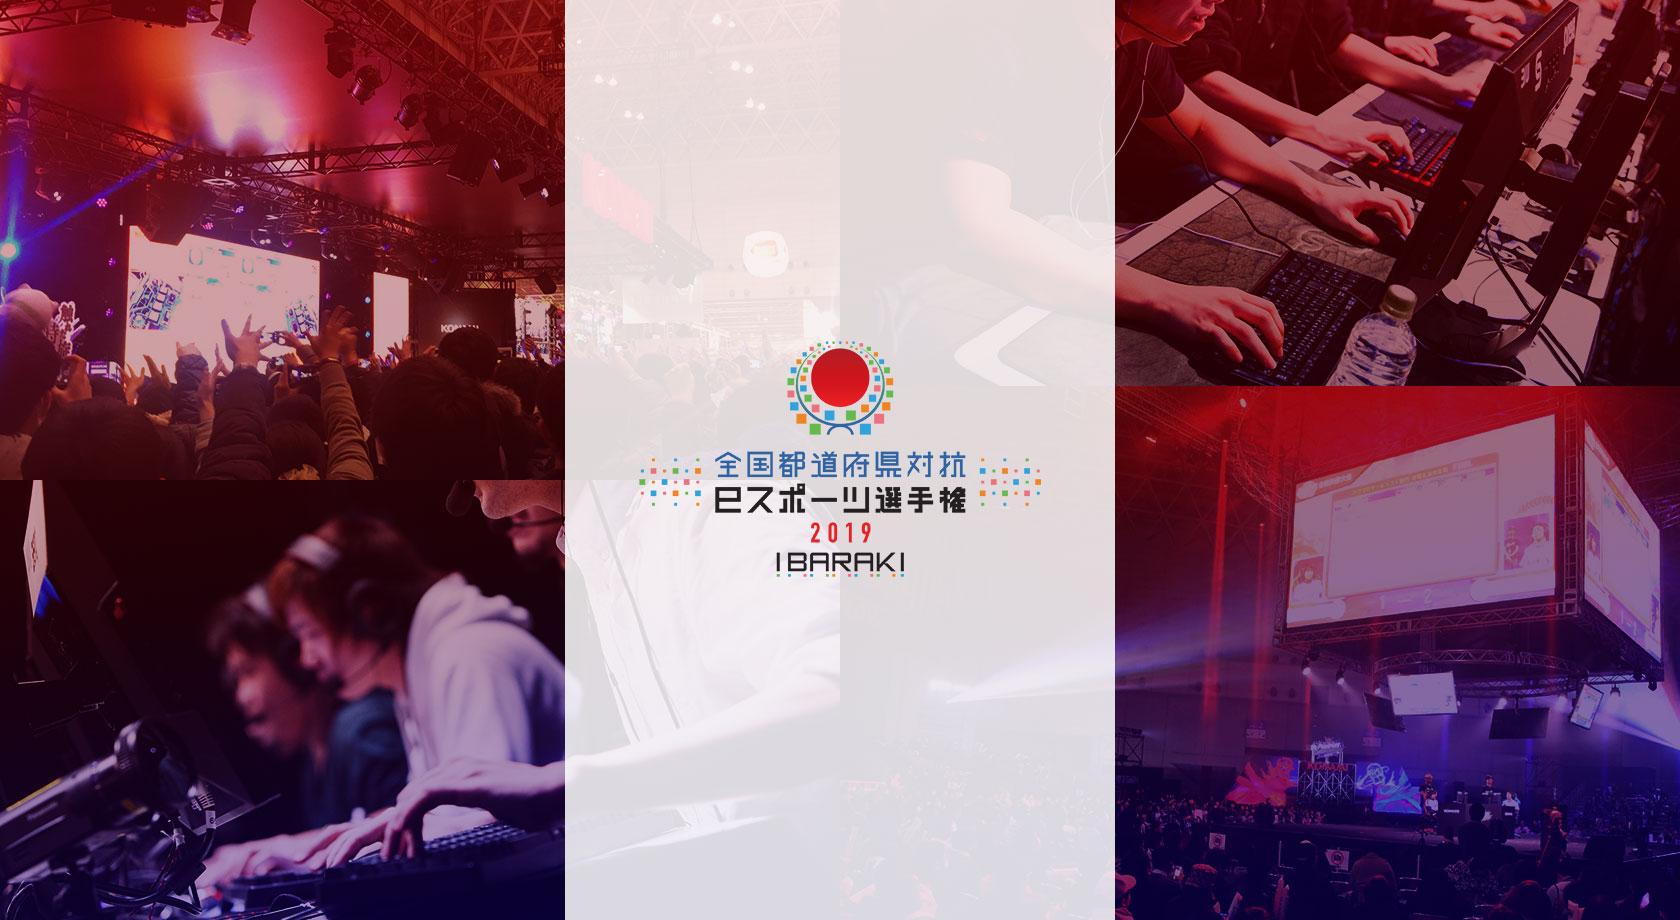 全国都道府県対応 eスポーツ選手権2019 IBARAKI